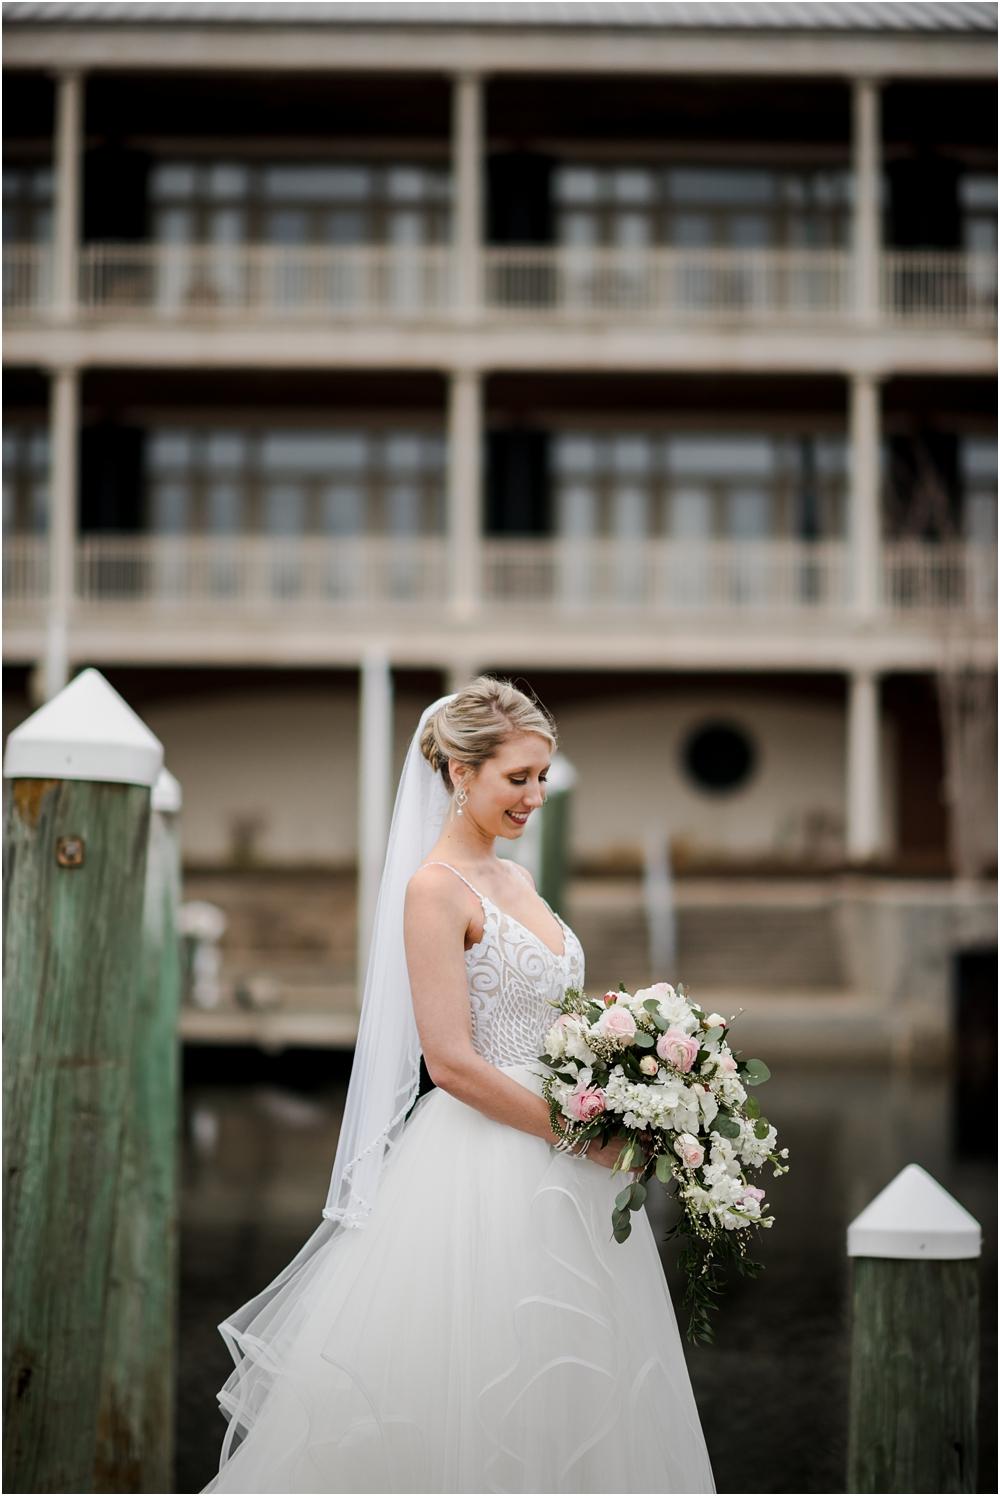 oconnor-pensacola-florida-wedding-photographer-kiersten-taylor-76.jpg